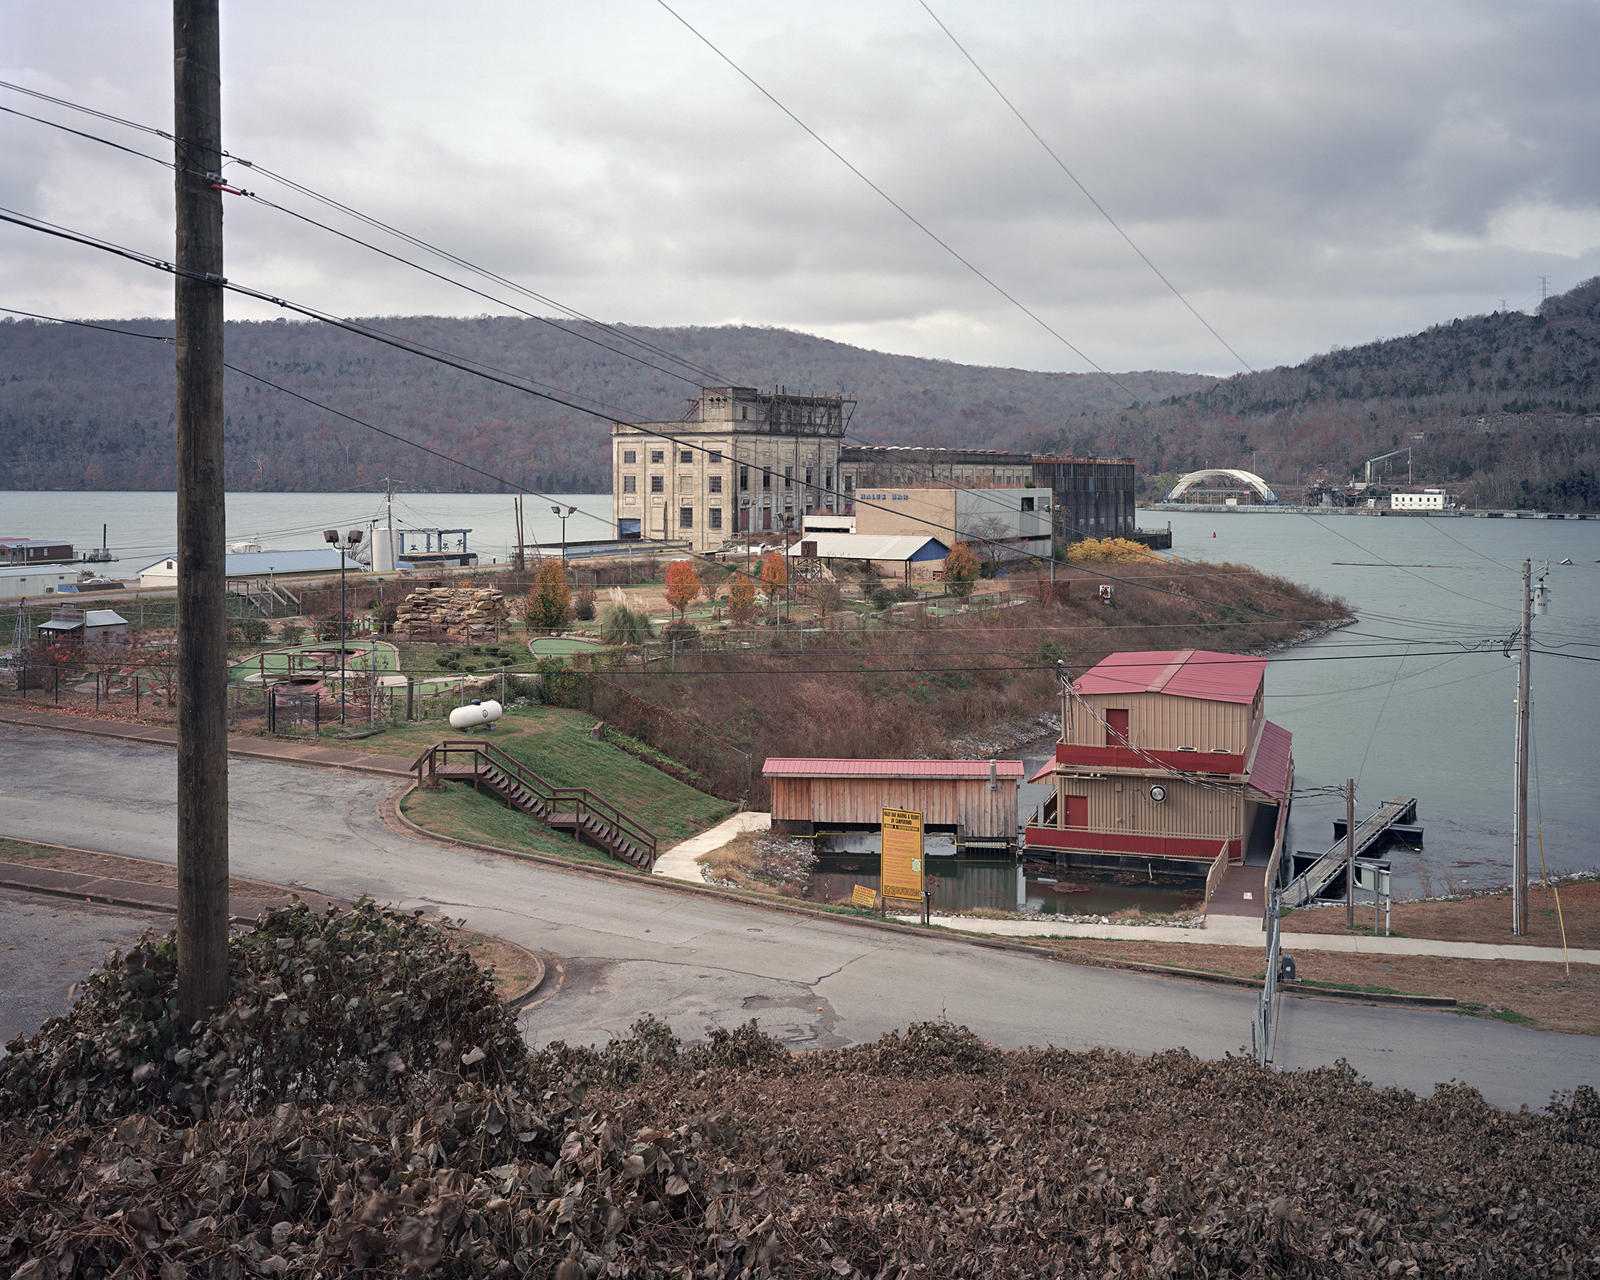 Hales Bar Dam, Tennessee River, Haletown, Tennessee  2013